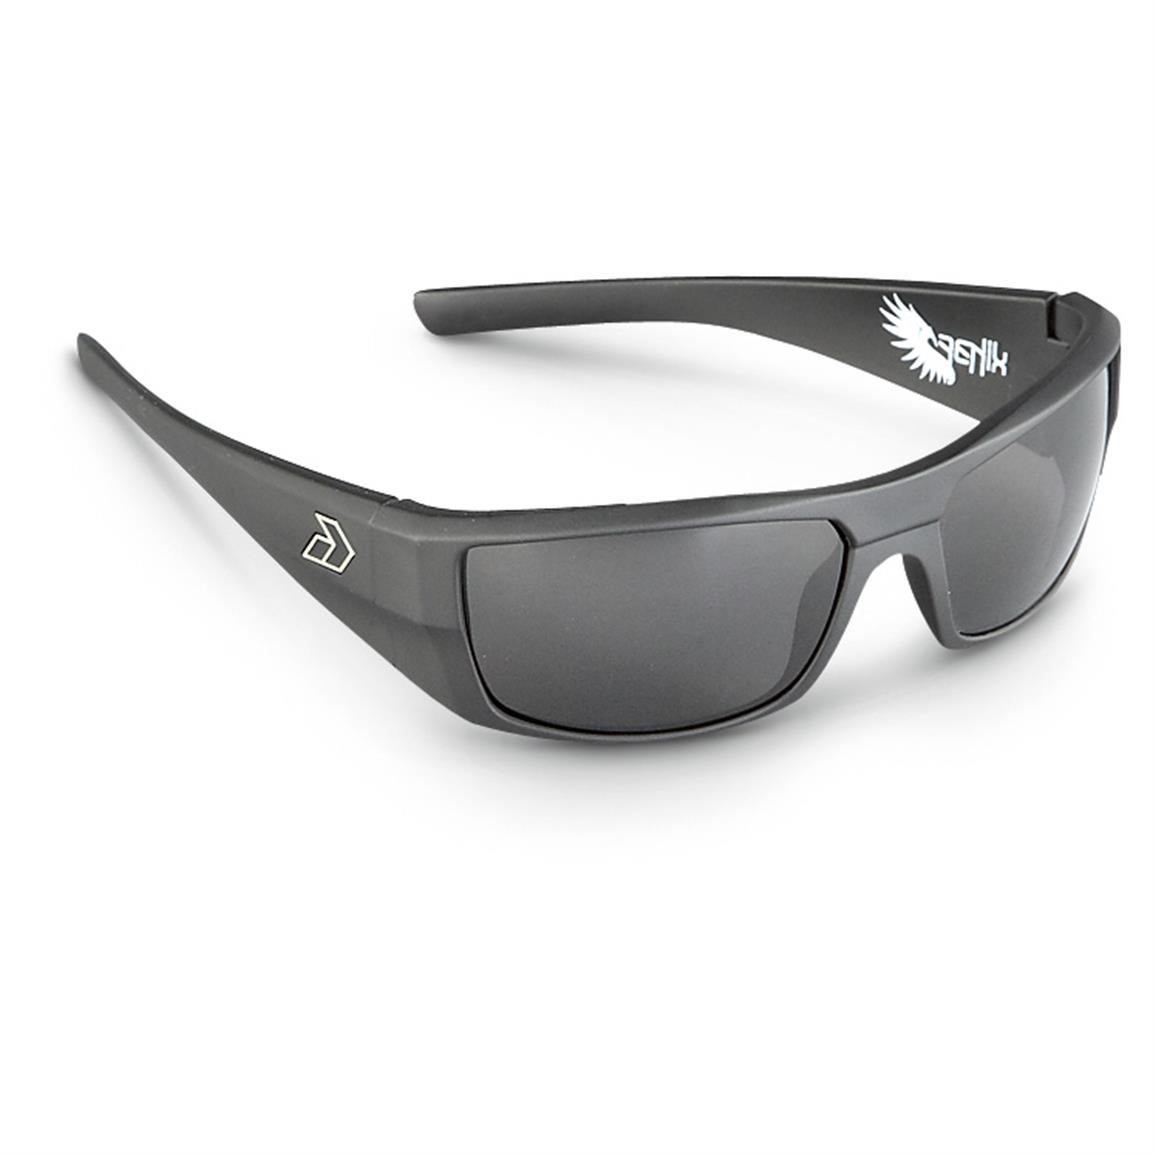 Winter Update on Gatorz and Julbo Photochromaticc Sunglasses